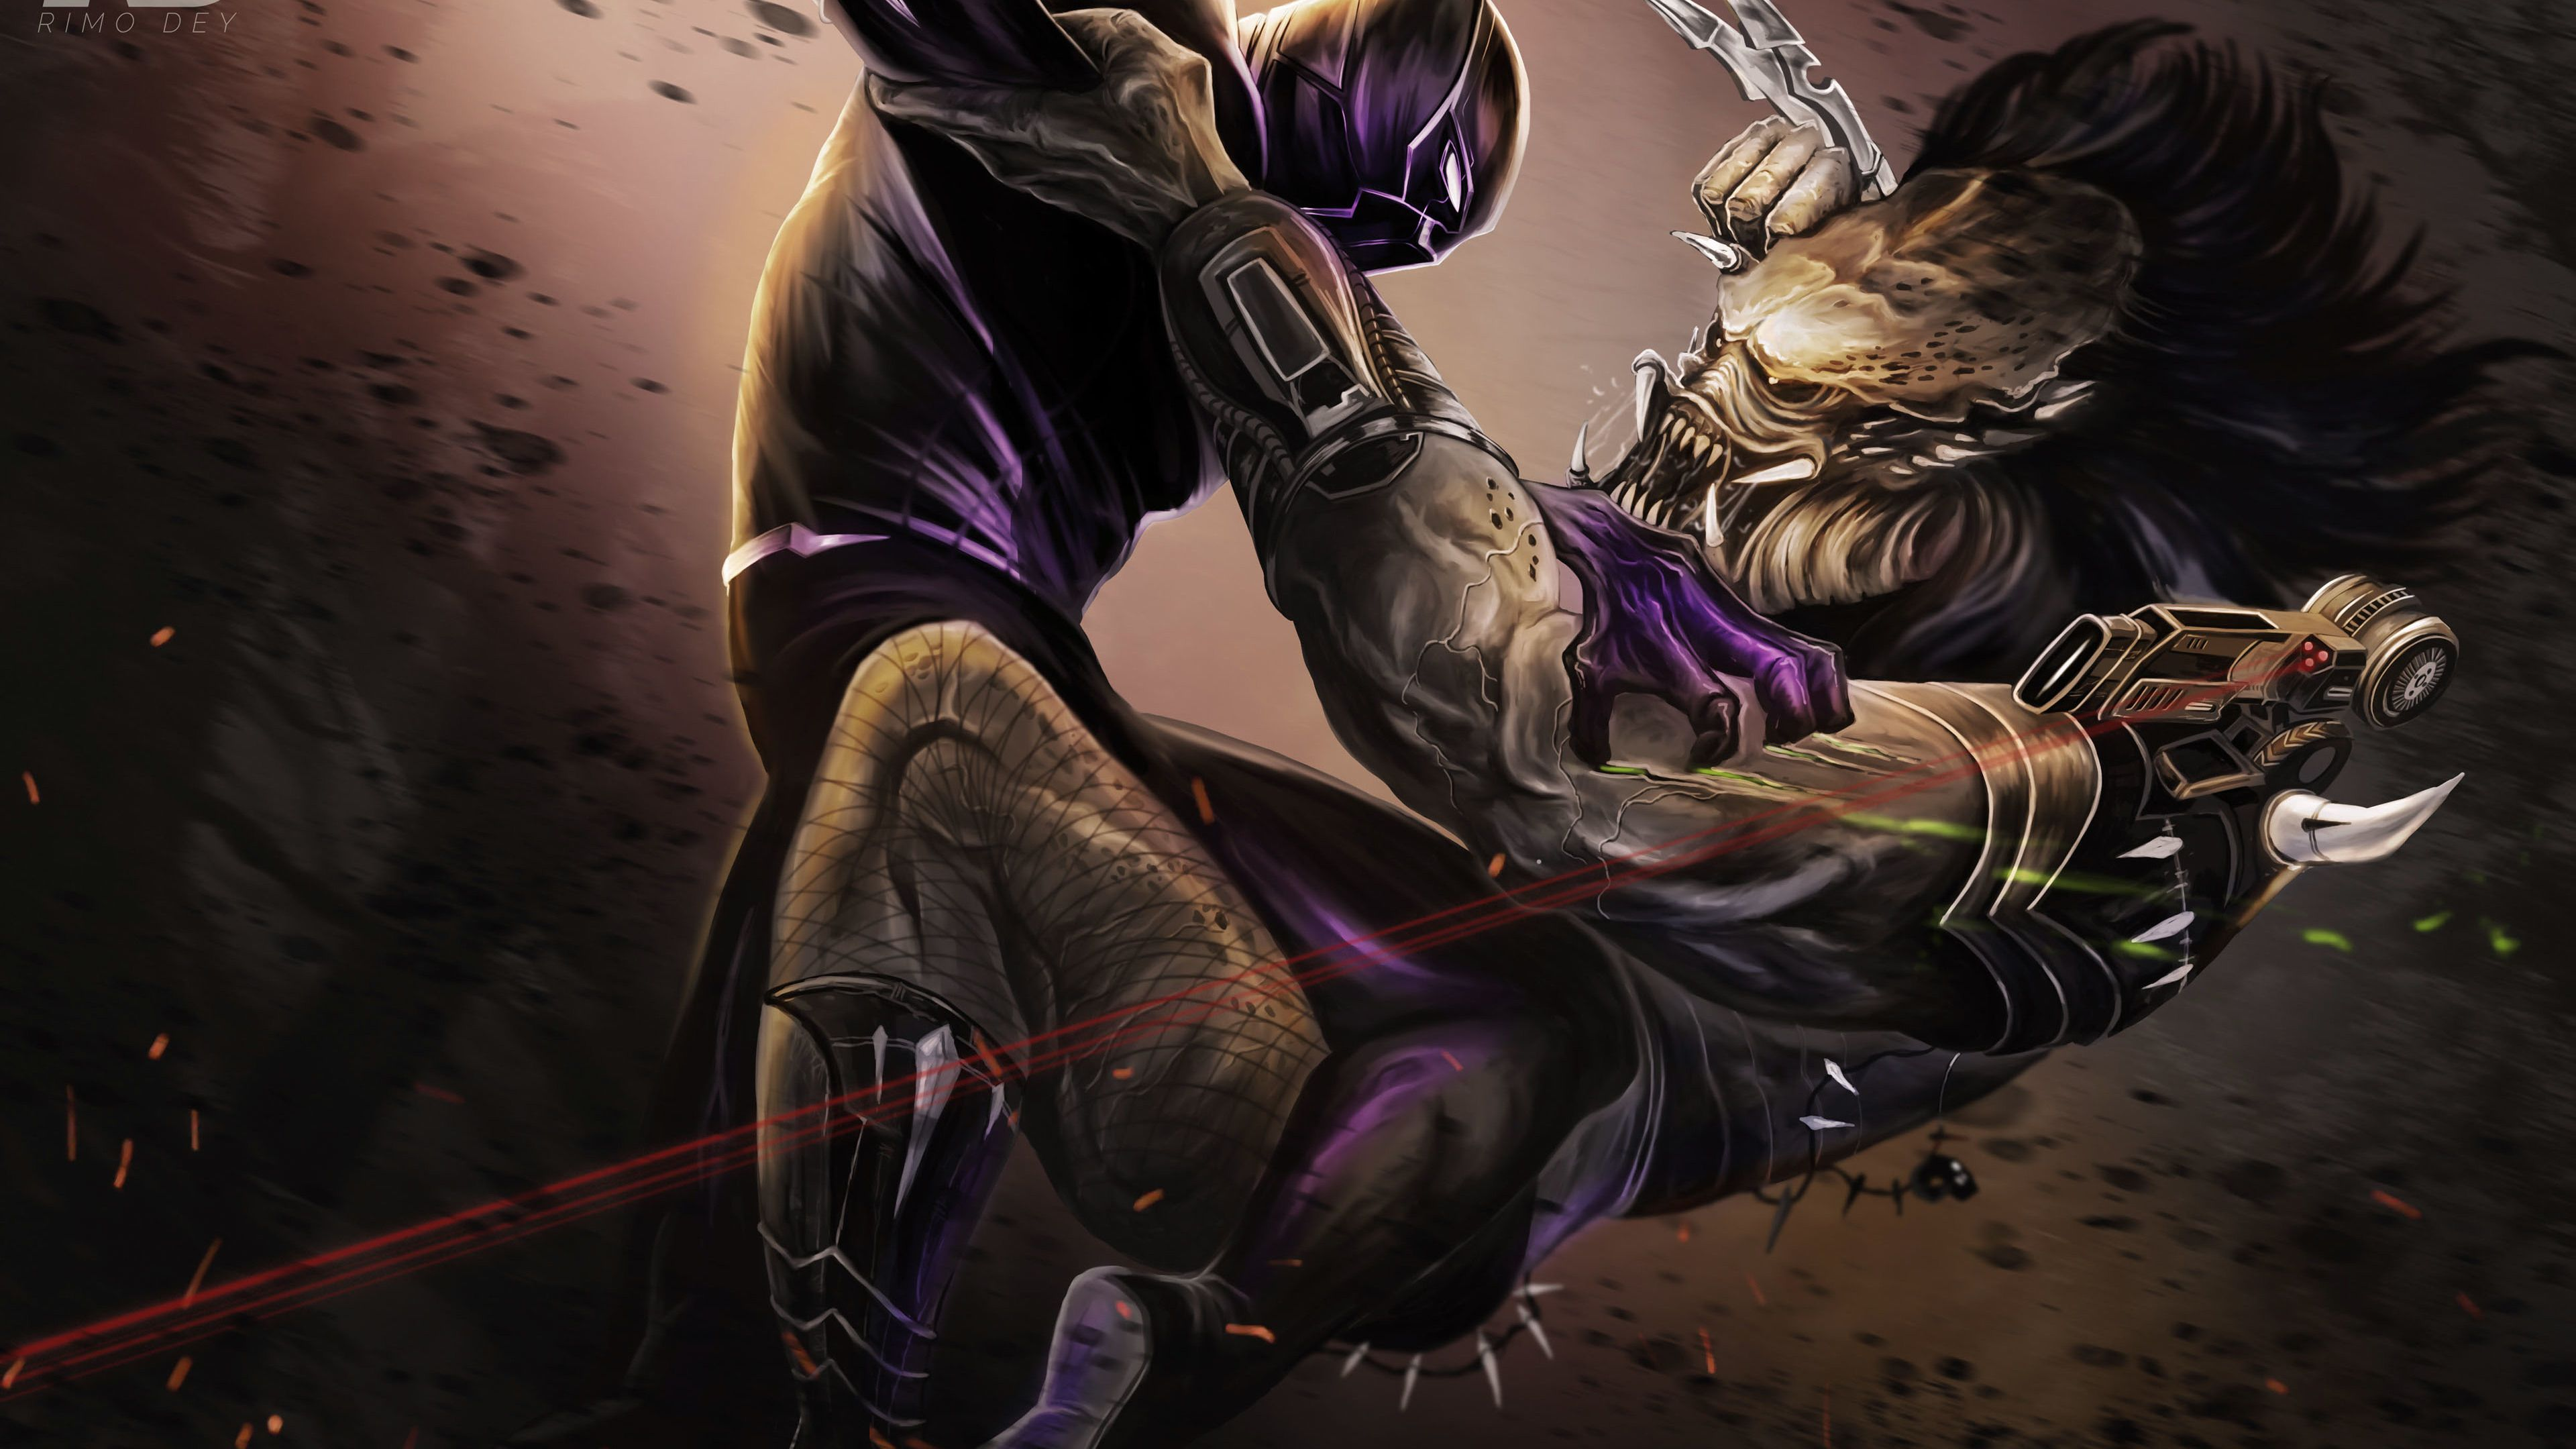 Black Panther Vs Predator Illustration 4k Superheroes Wallpapers Predator Wallpapers Hd Wallpapers Digital Art Wall Black Panther Illustration Art Wallpaper